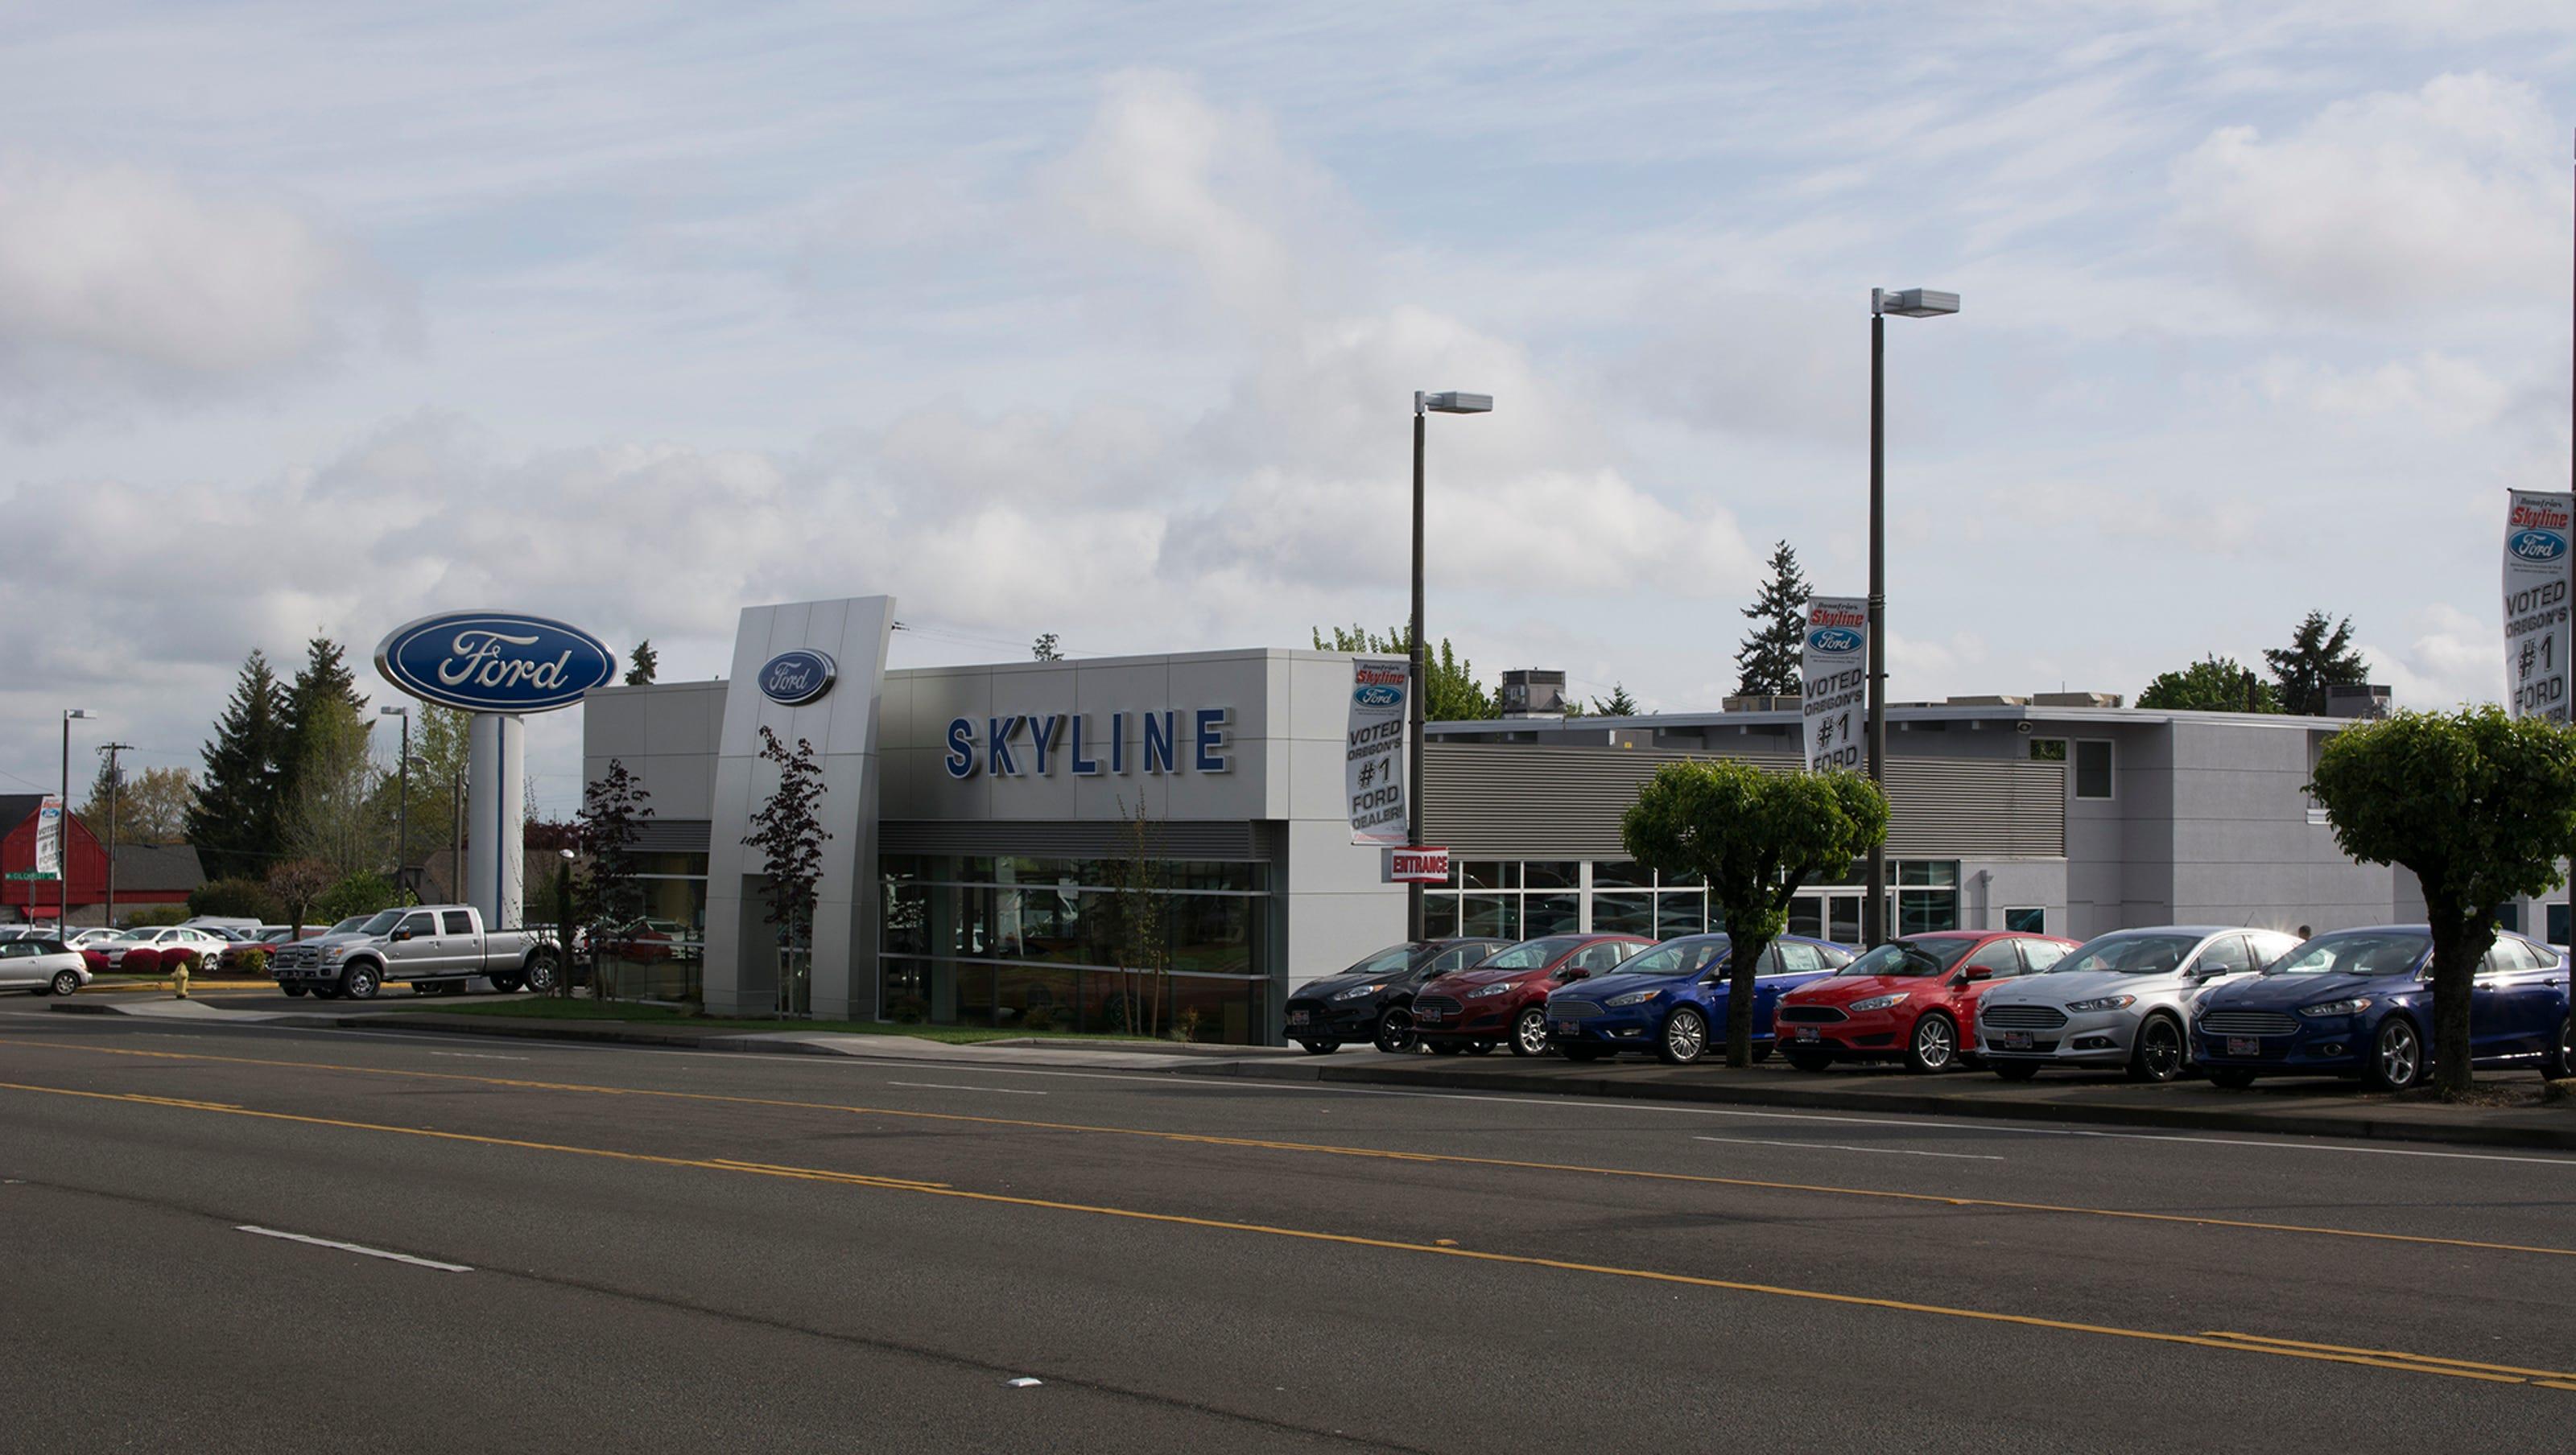 Skyline named best ford dealer in oregon for 4th year